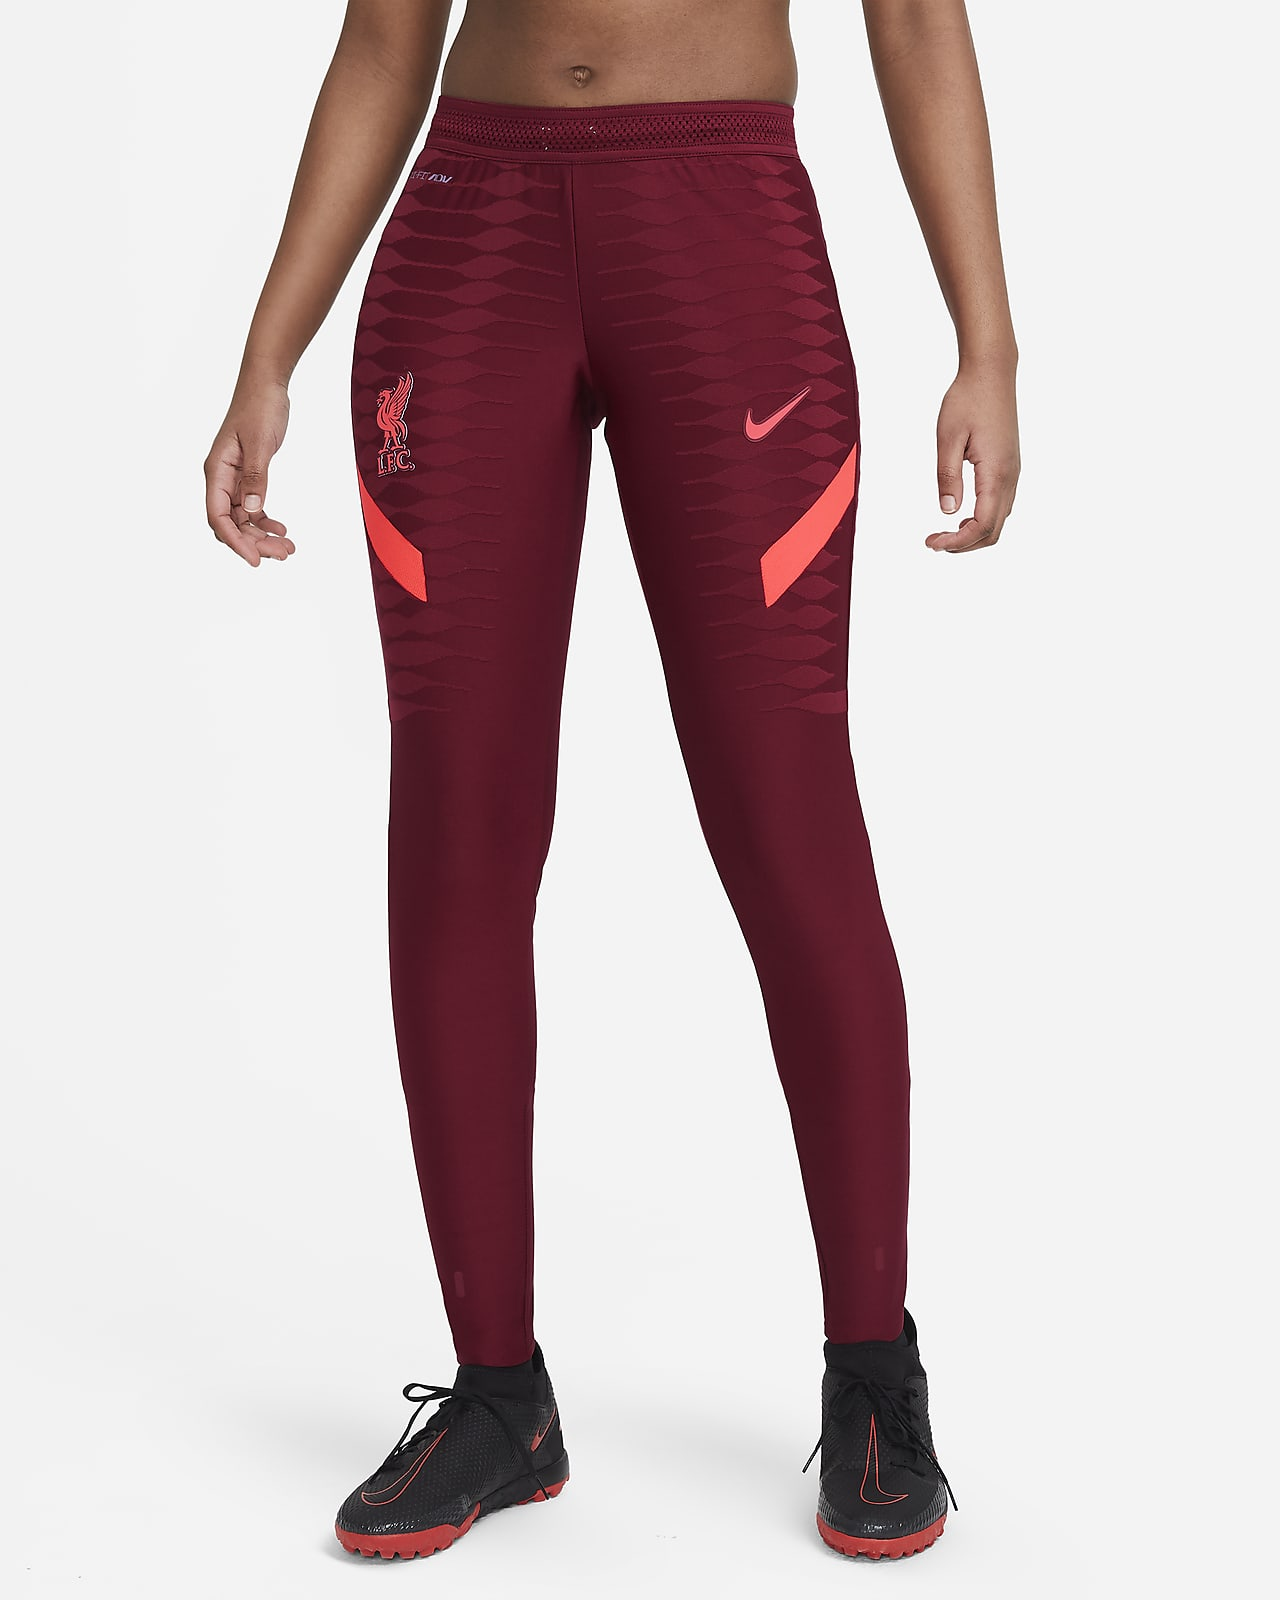 Liverpool F.C. Elite Women's Nike Dri-FIT ADV Football Pants